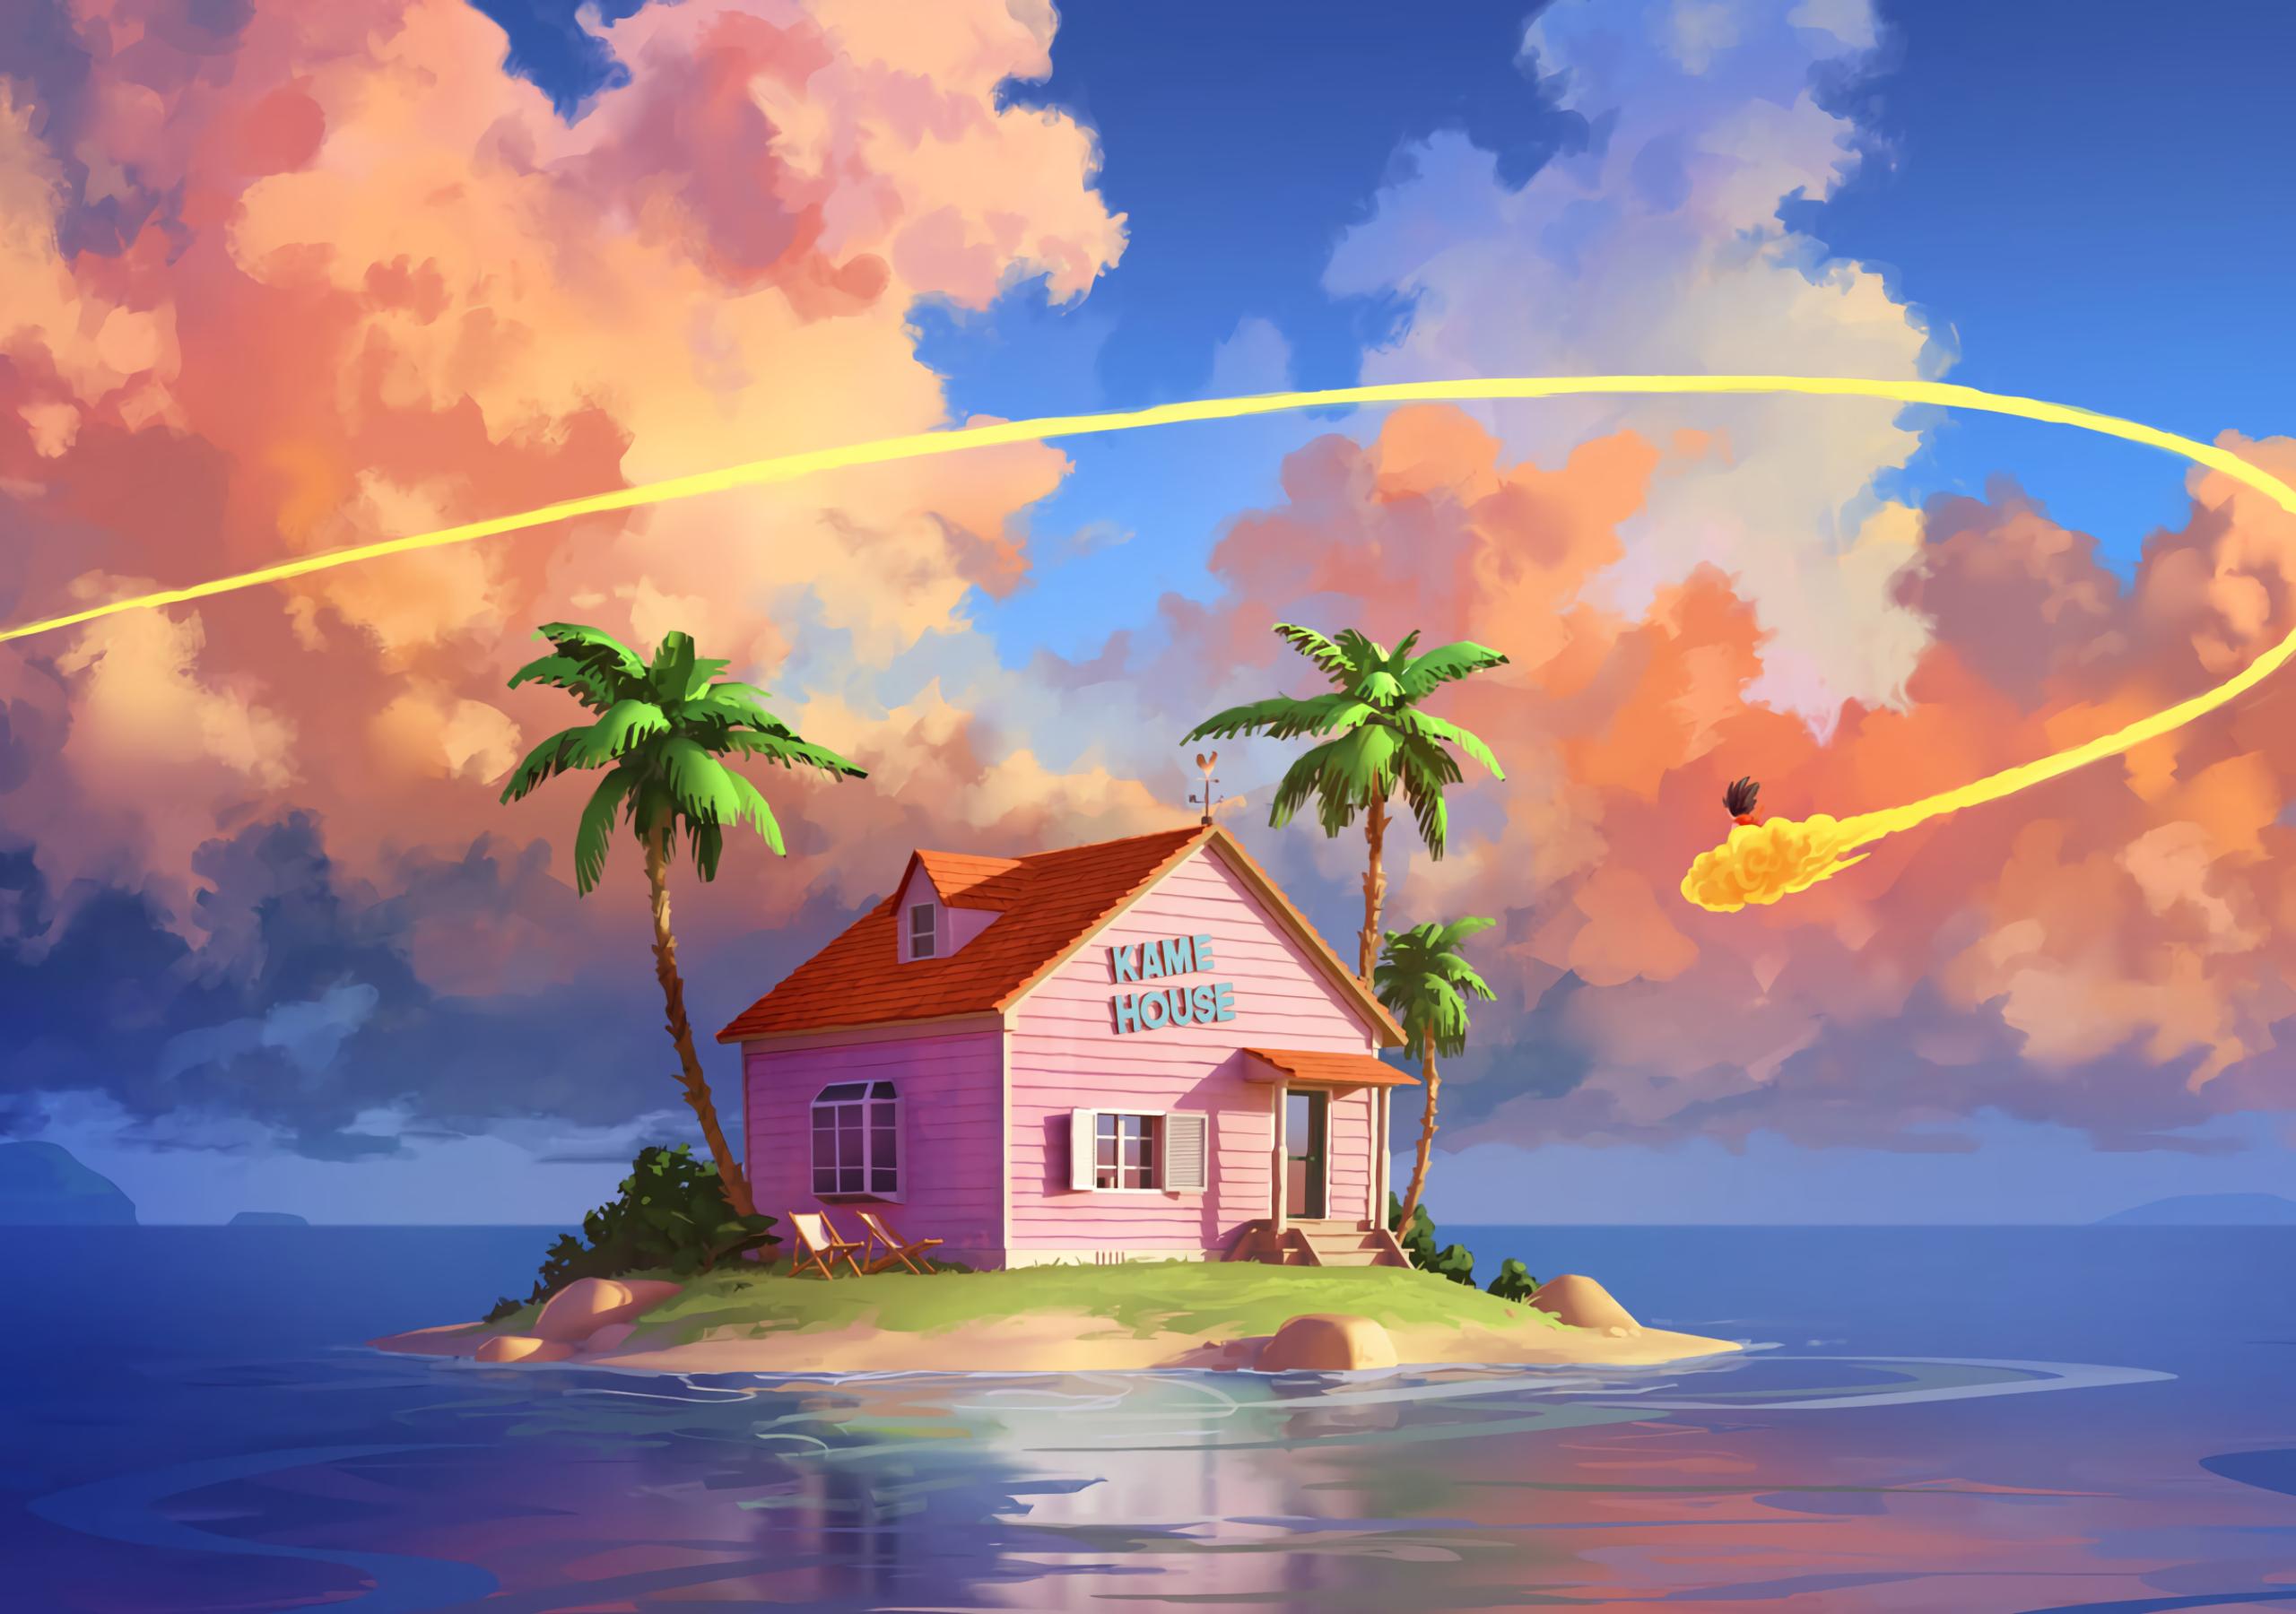 2560x1800 Kame House Dragon Ball Z 2560x1800 Resolution ...